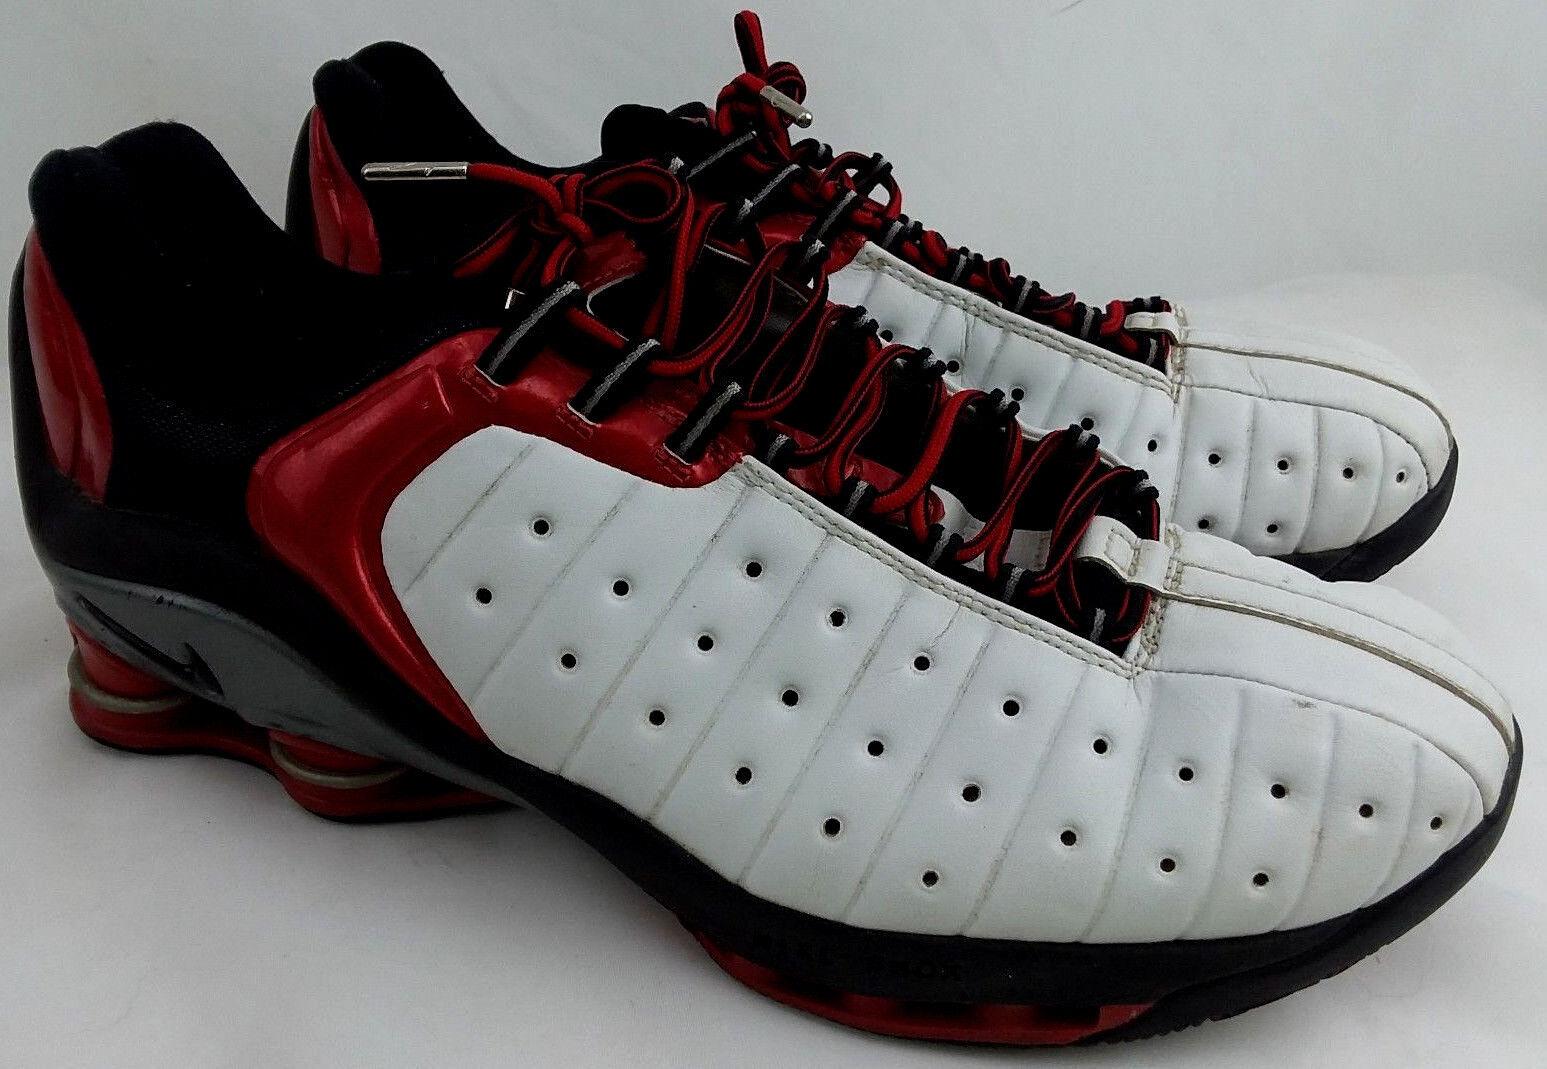 Nike schuhe größe 13 männer, nike shox vc niedrigen carter vince carter niedrigen vinsanity 2002 (s1) b80cc9